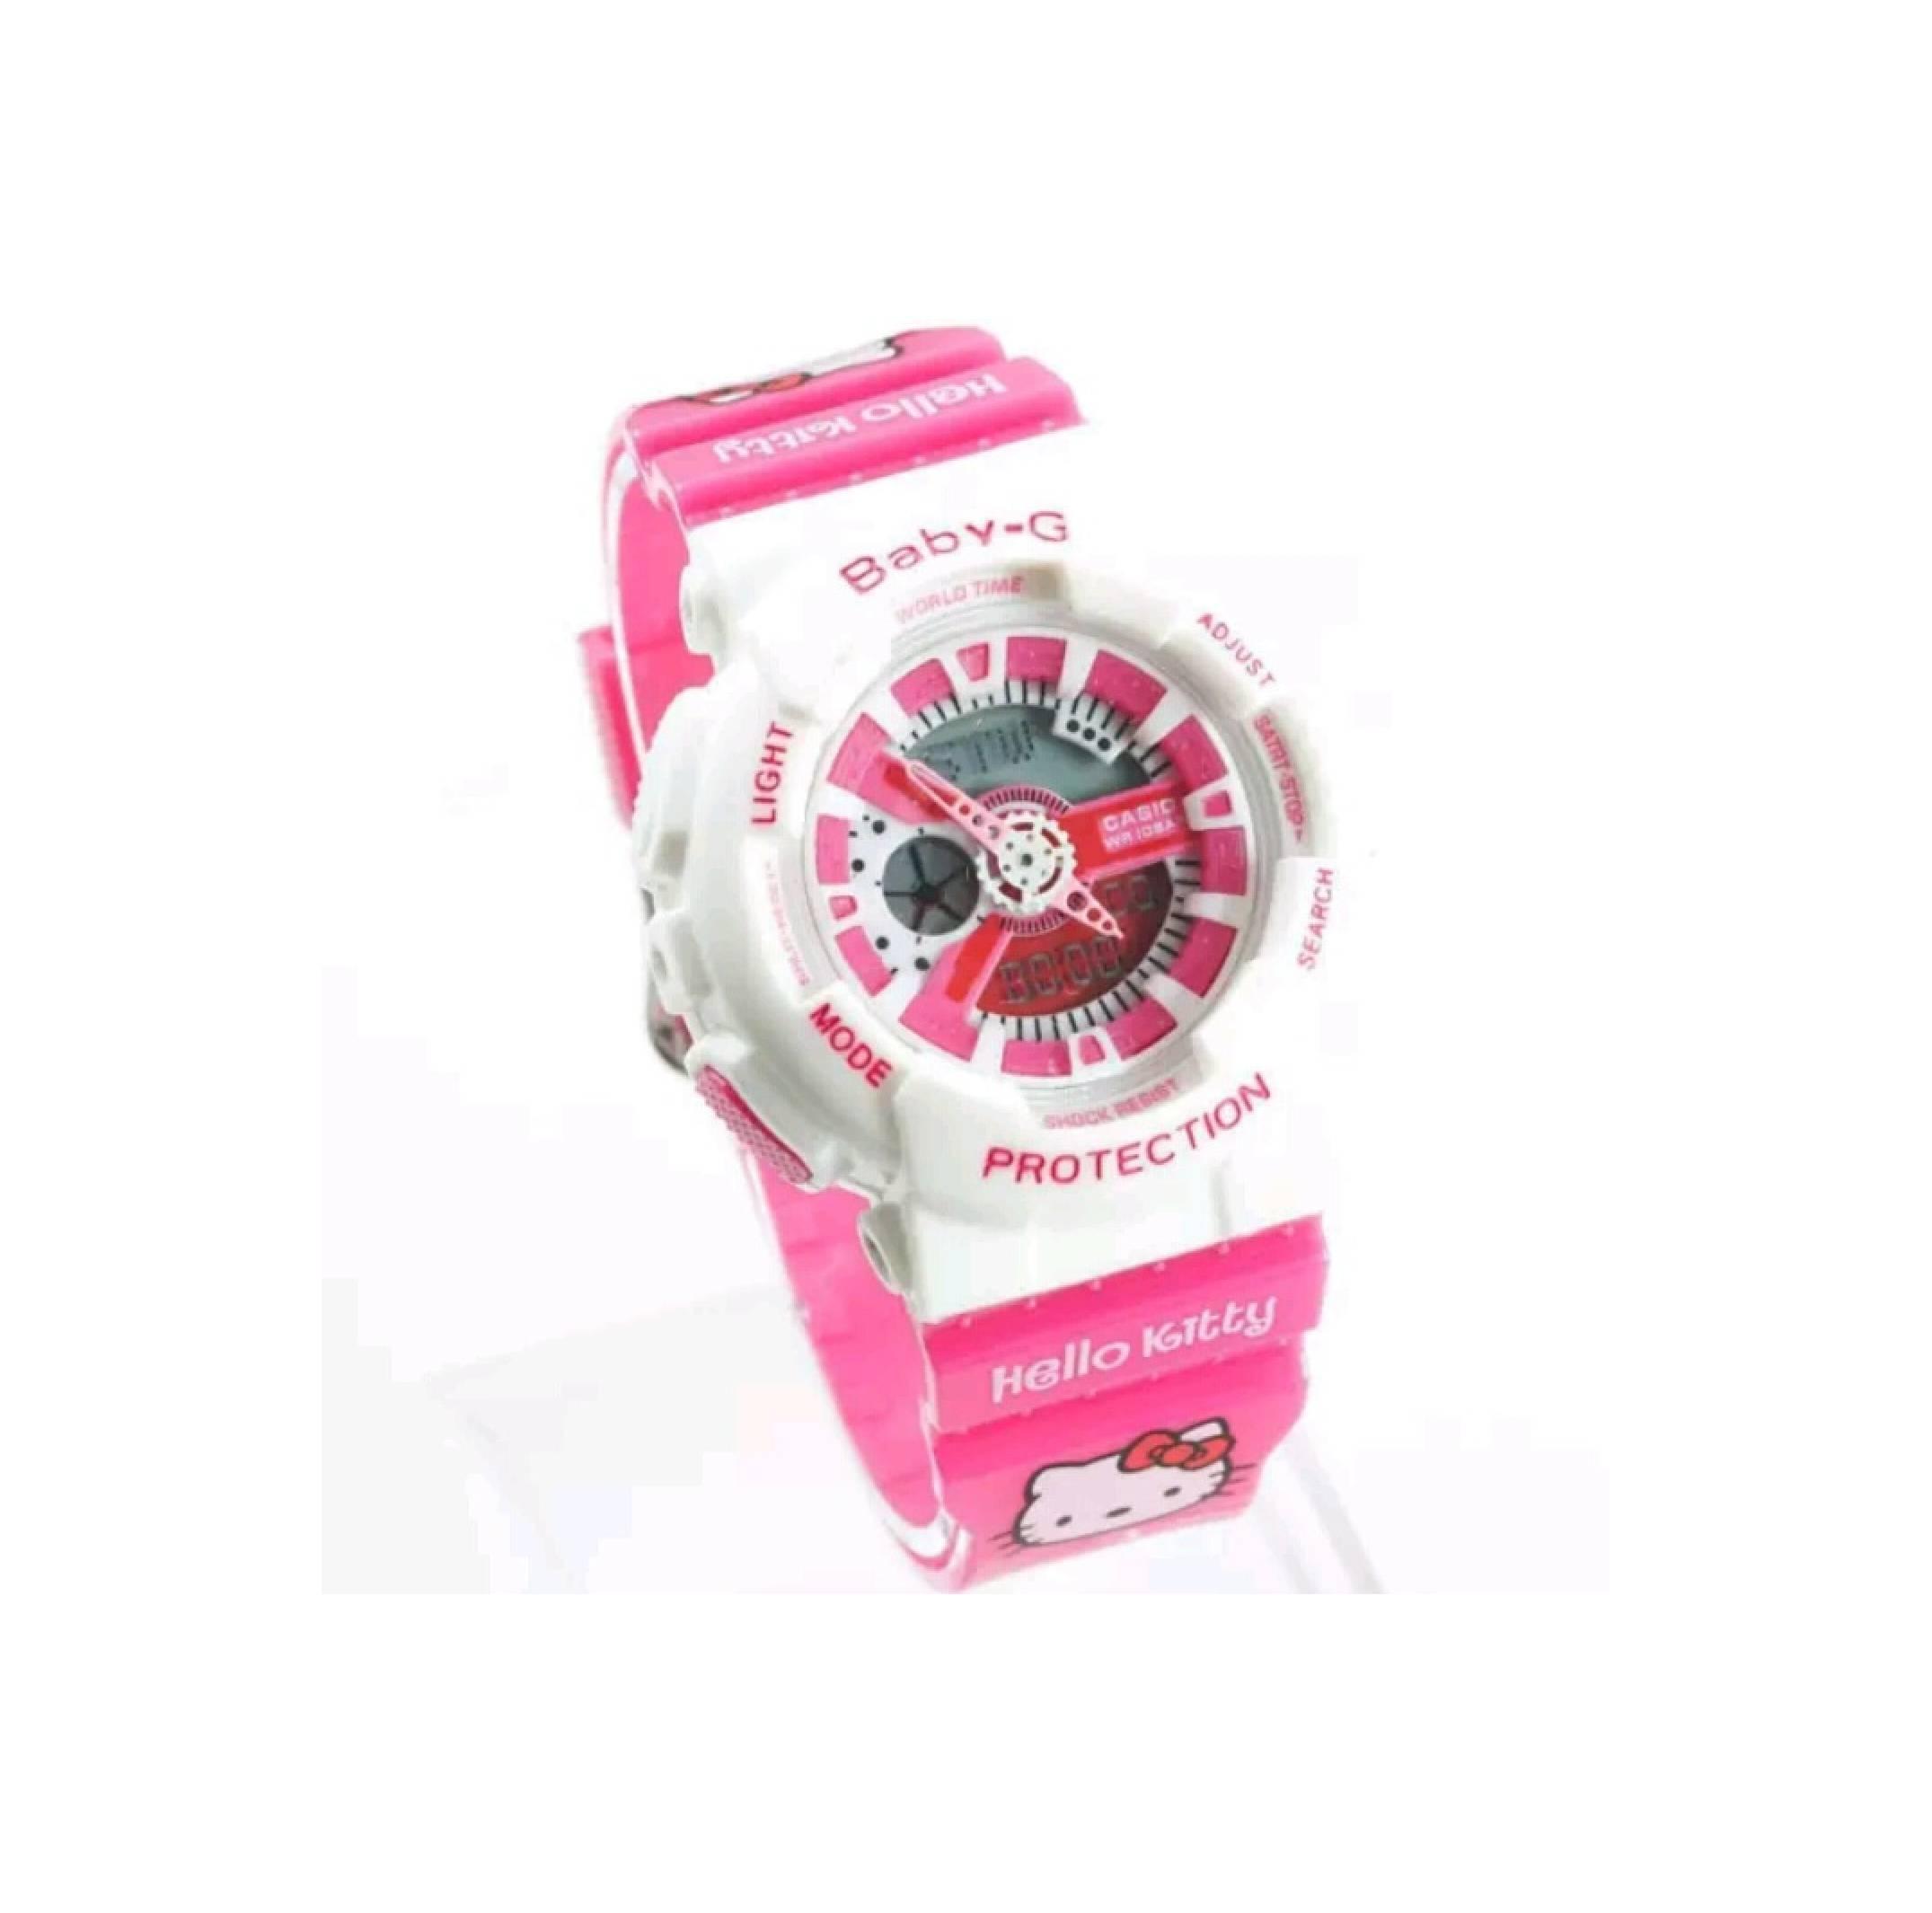 Kehebatan Ba110bc 1a Baby G Ba 110 Series Womens Watches Dan Harga Casio 112 Hitam Jam Tangan Wanita Anak Ba110 Hello Kitty